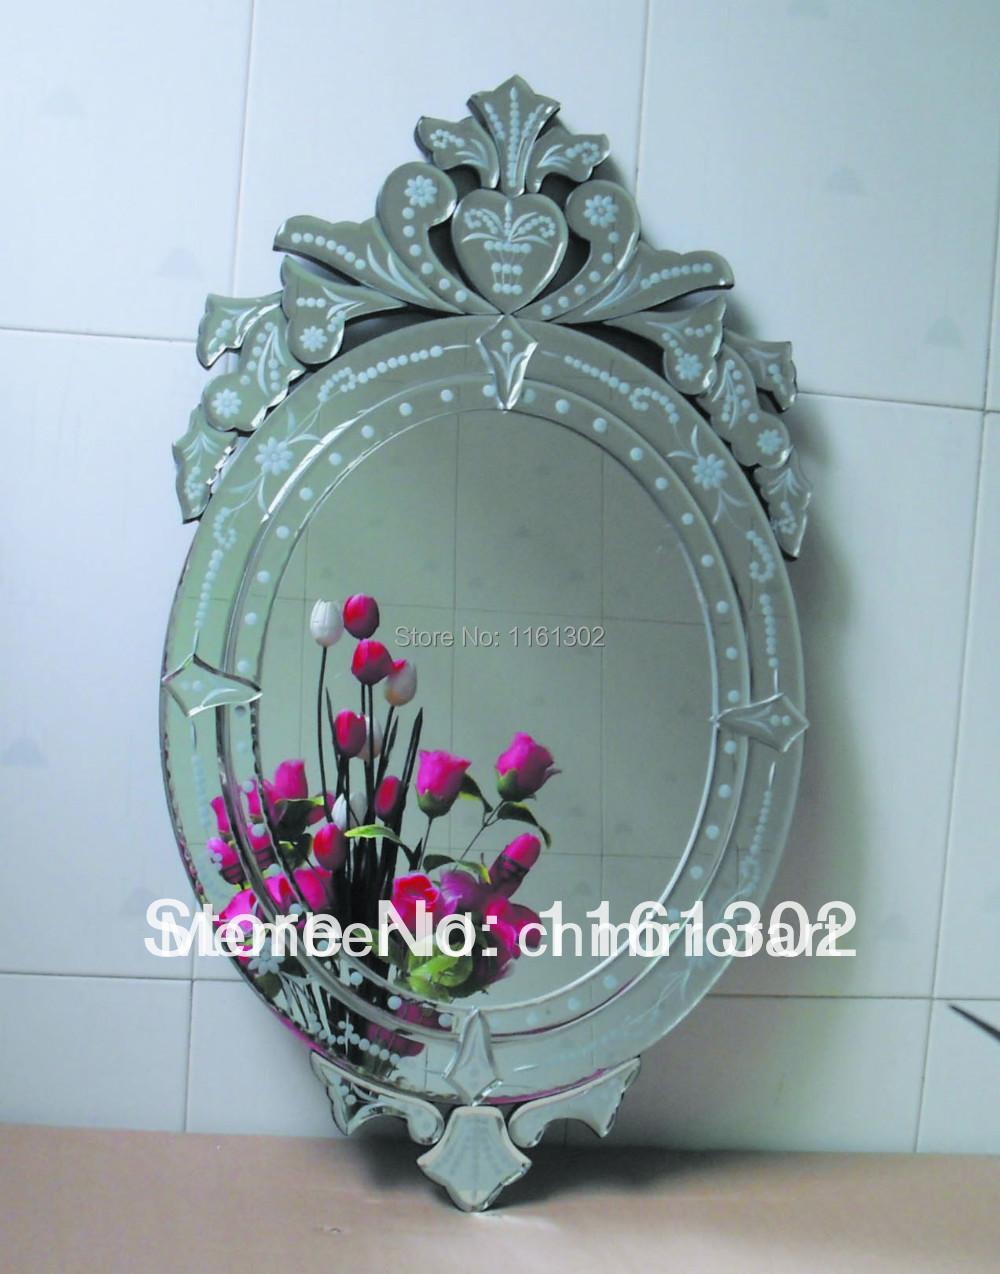 Mr 201061 cheap venetian wall mirror in mirrors from home for Miroir venitien pas cher